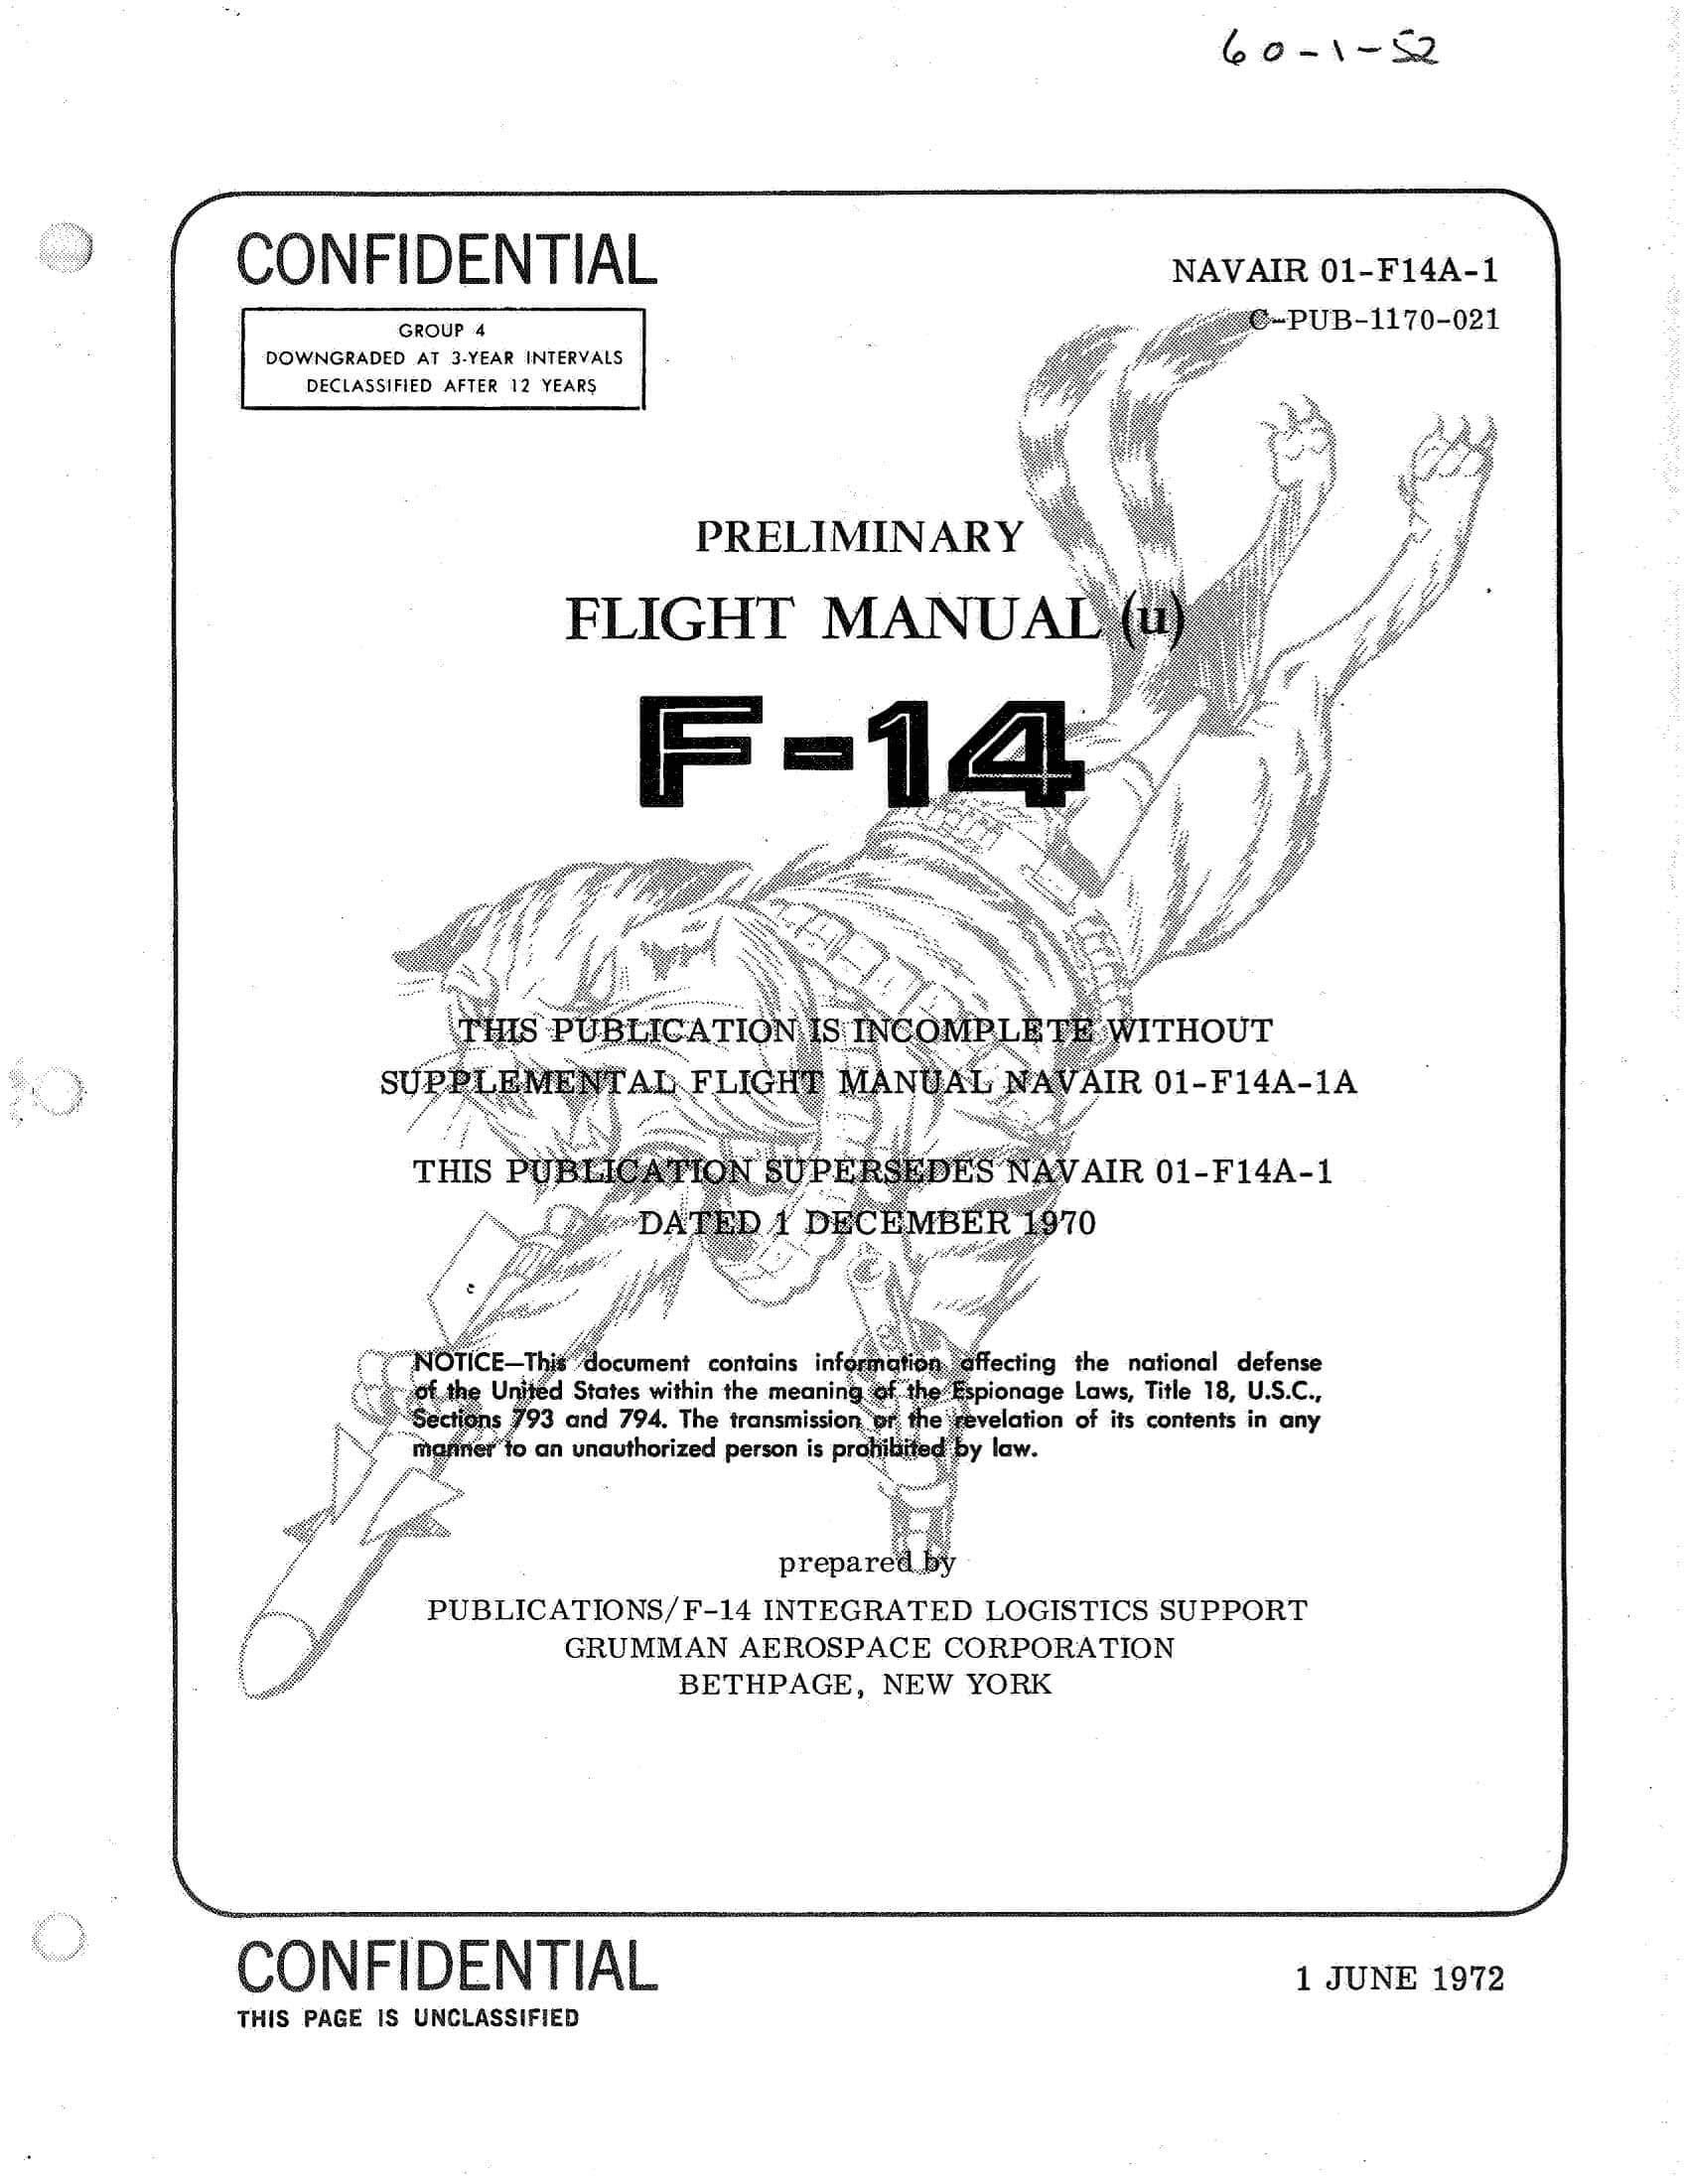 F 14 Diagram - Schematics Online F Drawings Blueprints Diagrams Schematics on